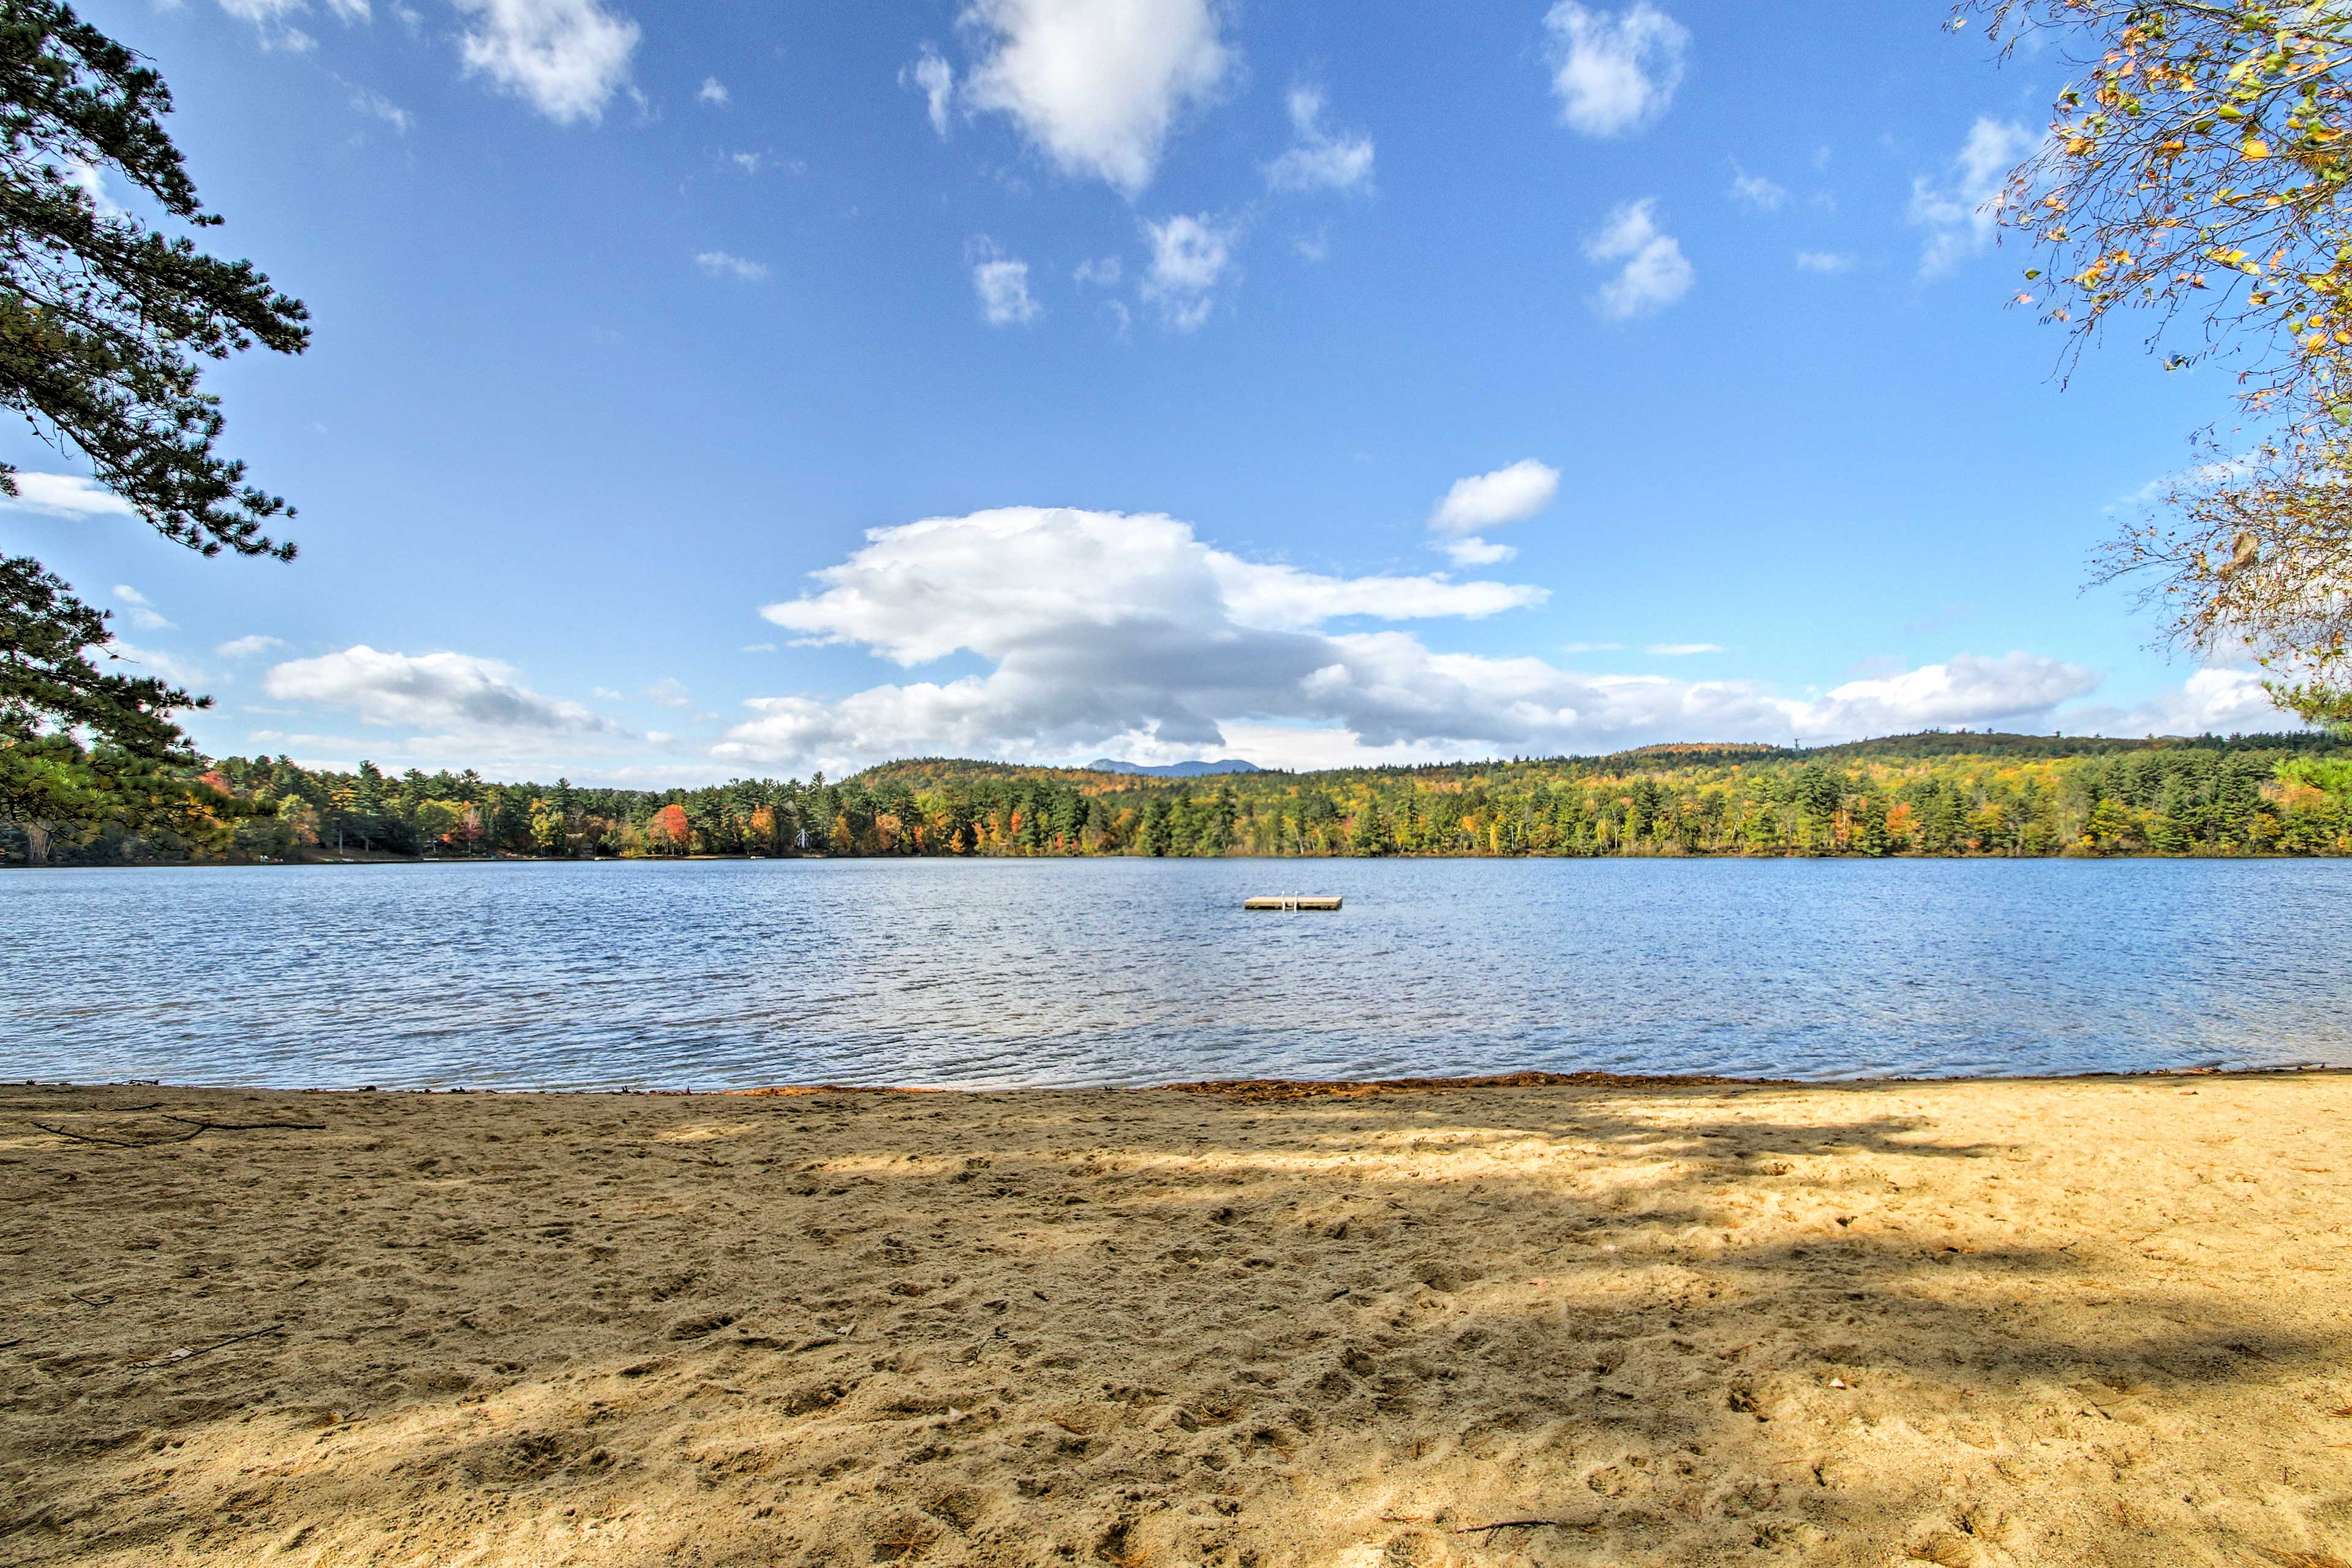 Plus, Cranmore Mountain Resort & Conway Lake aren't far either!